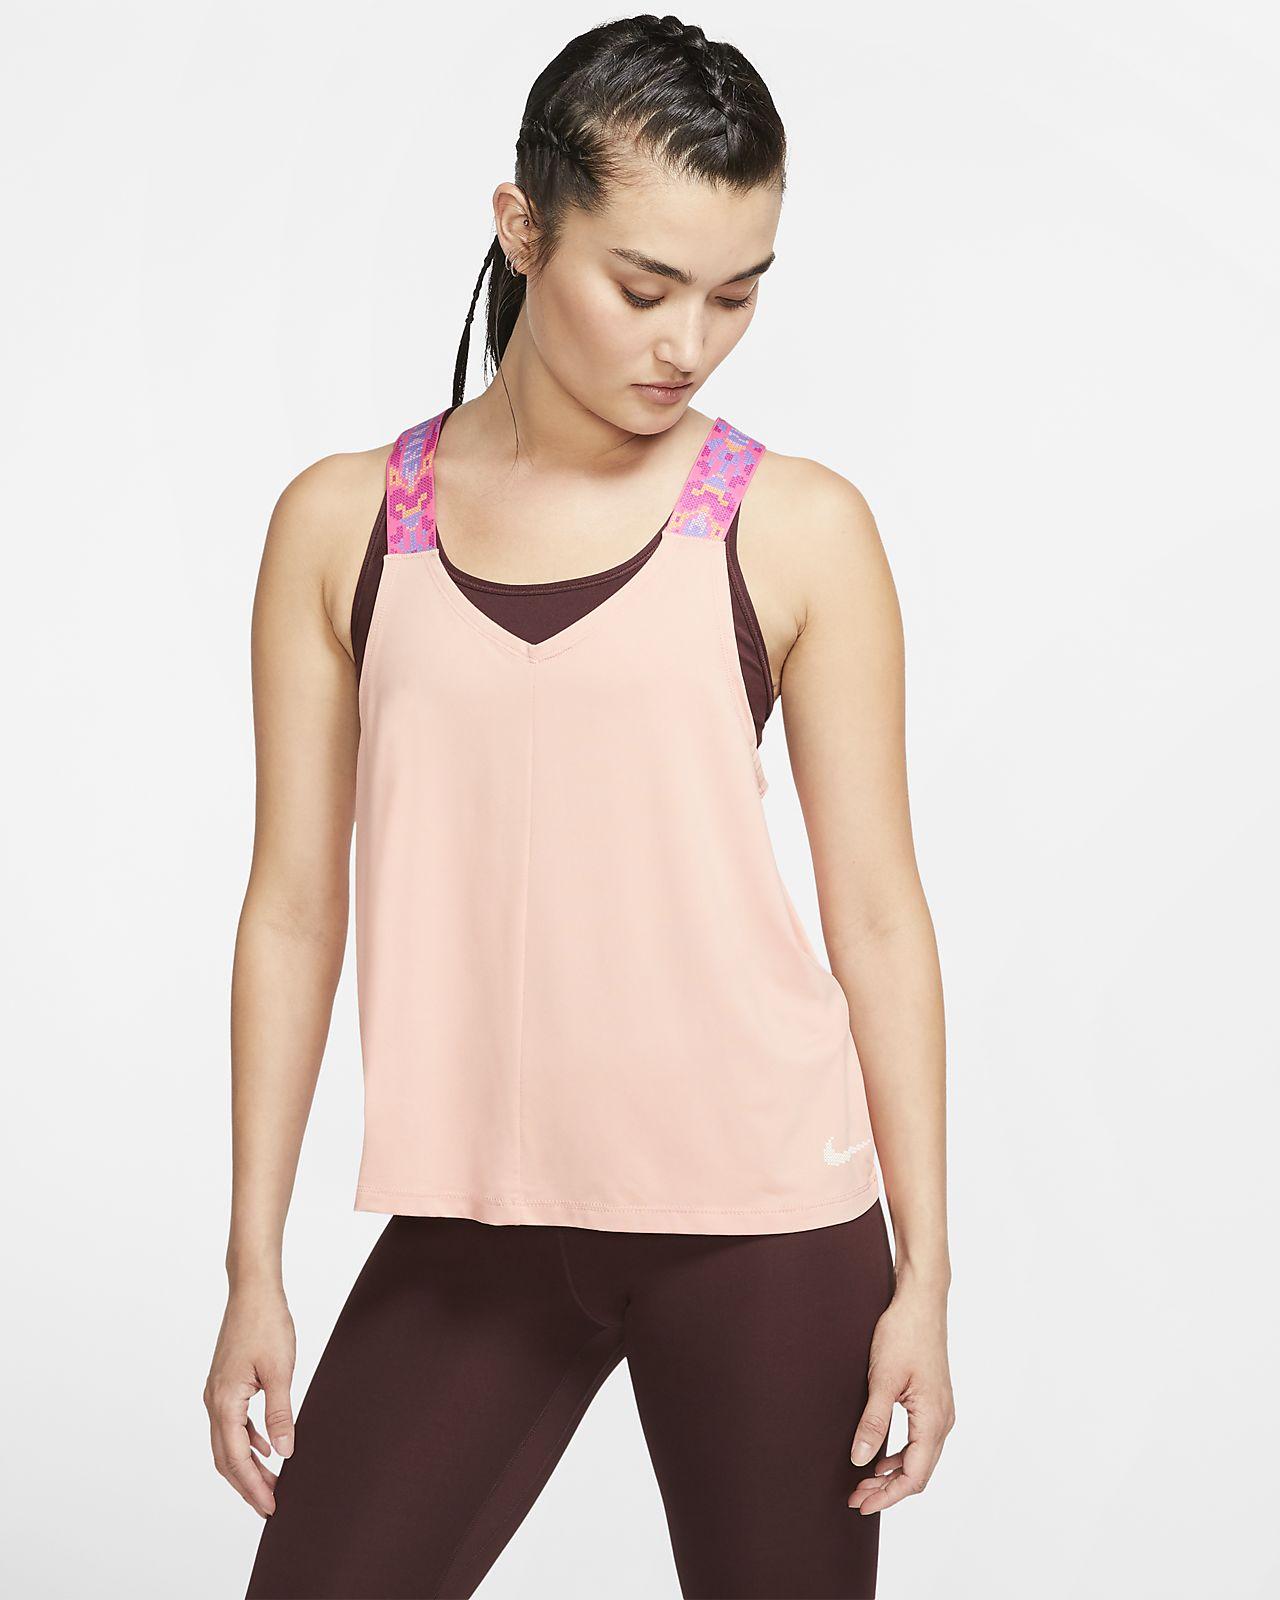 Damska koszulka treningowa bez rękawów Nike Elastika